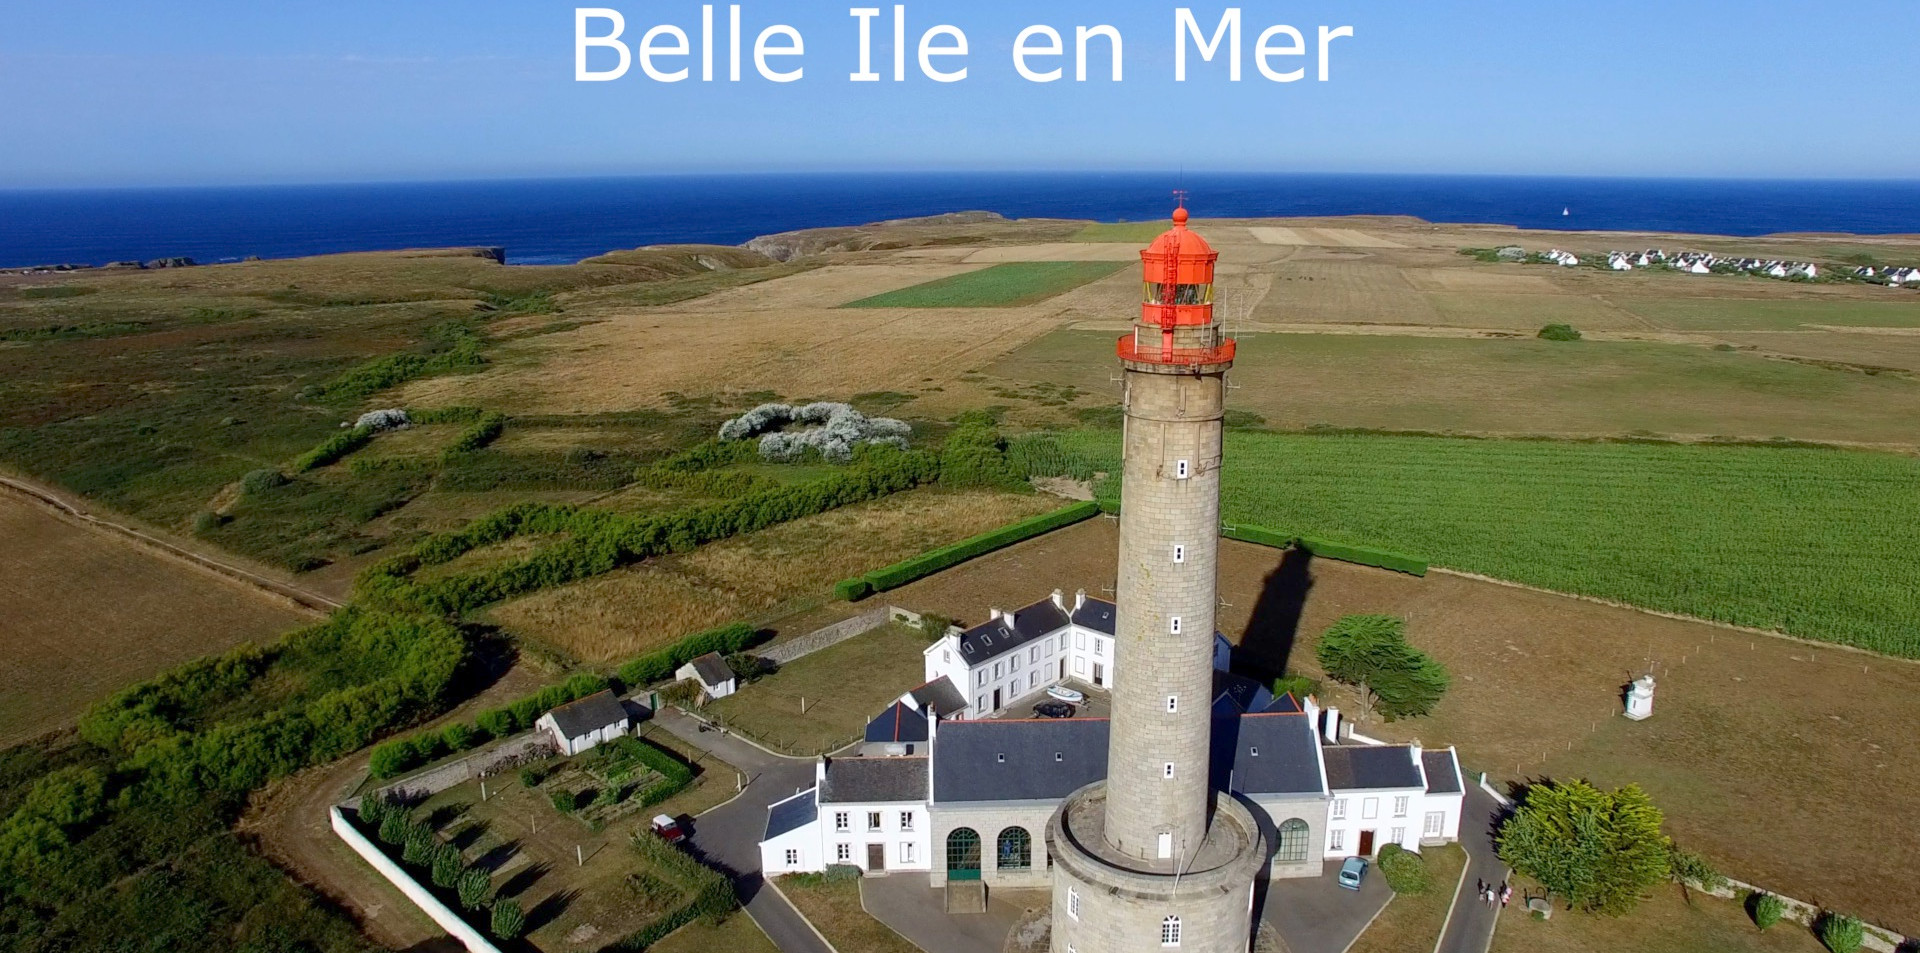 Belle-Ile-en-Mer par FlyUp Drone